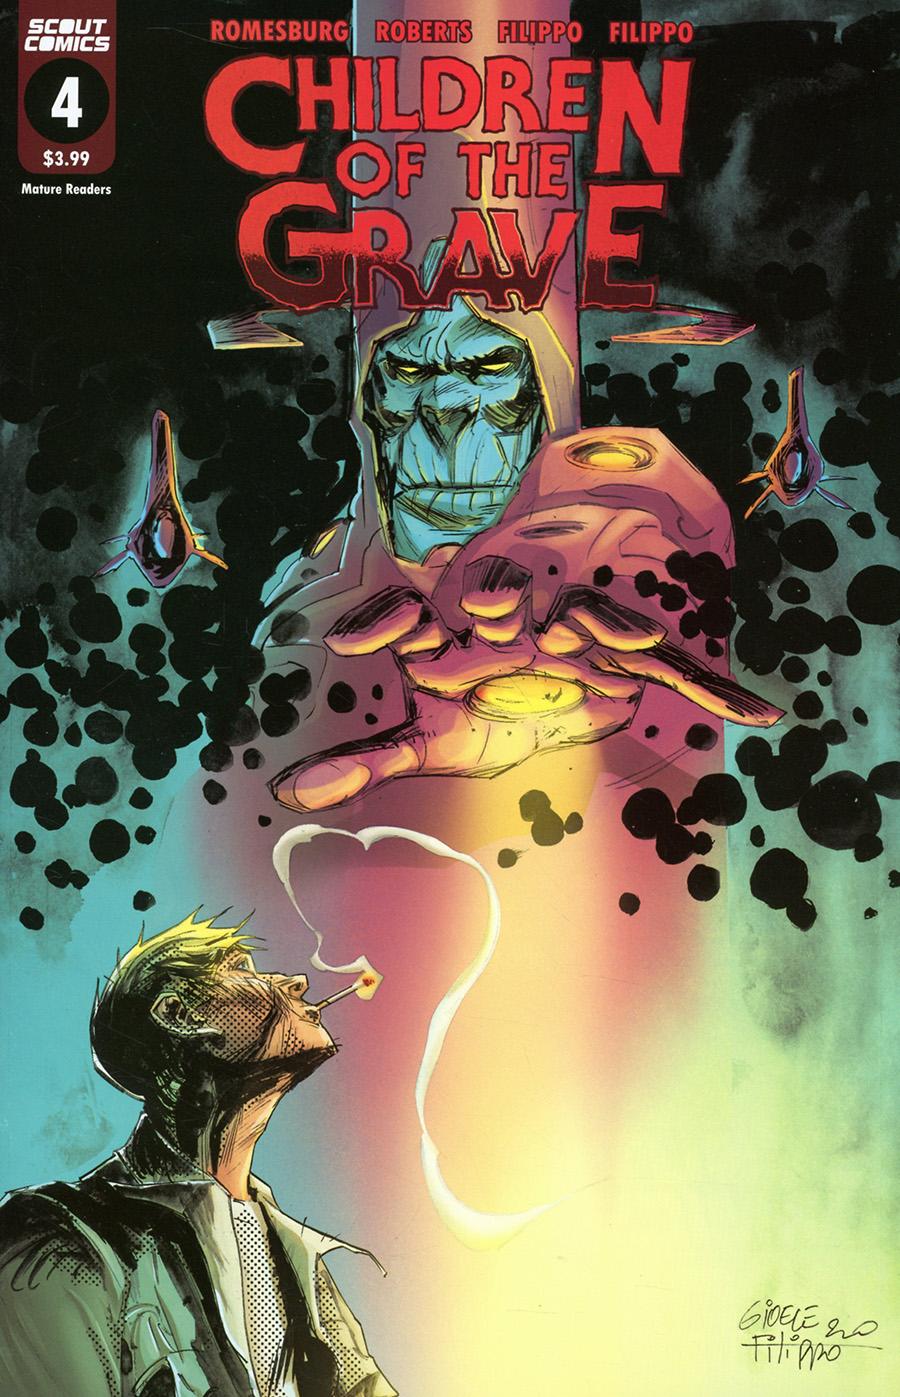 Children Of The Grave (Scout Comics) #4